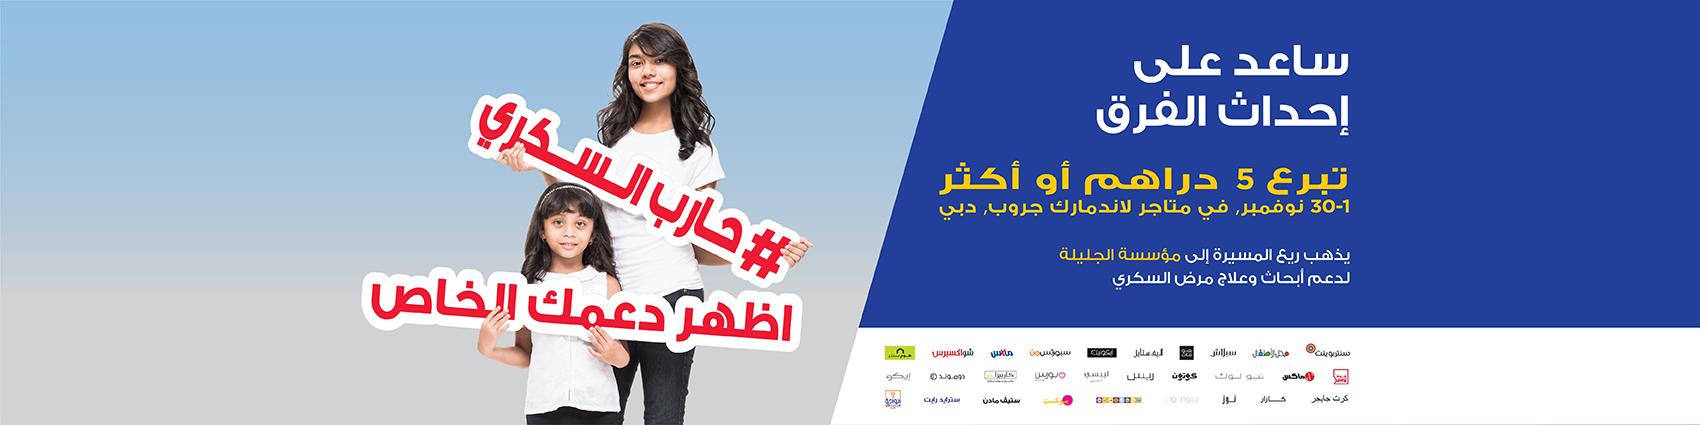 public://Fund Raising Banner Arabic.jpg